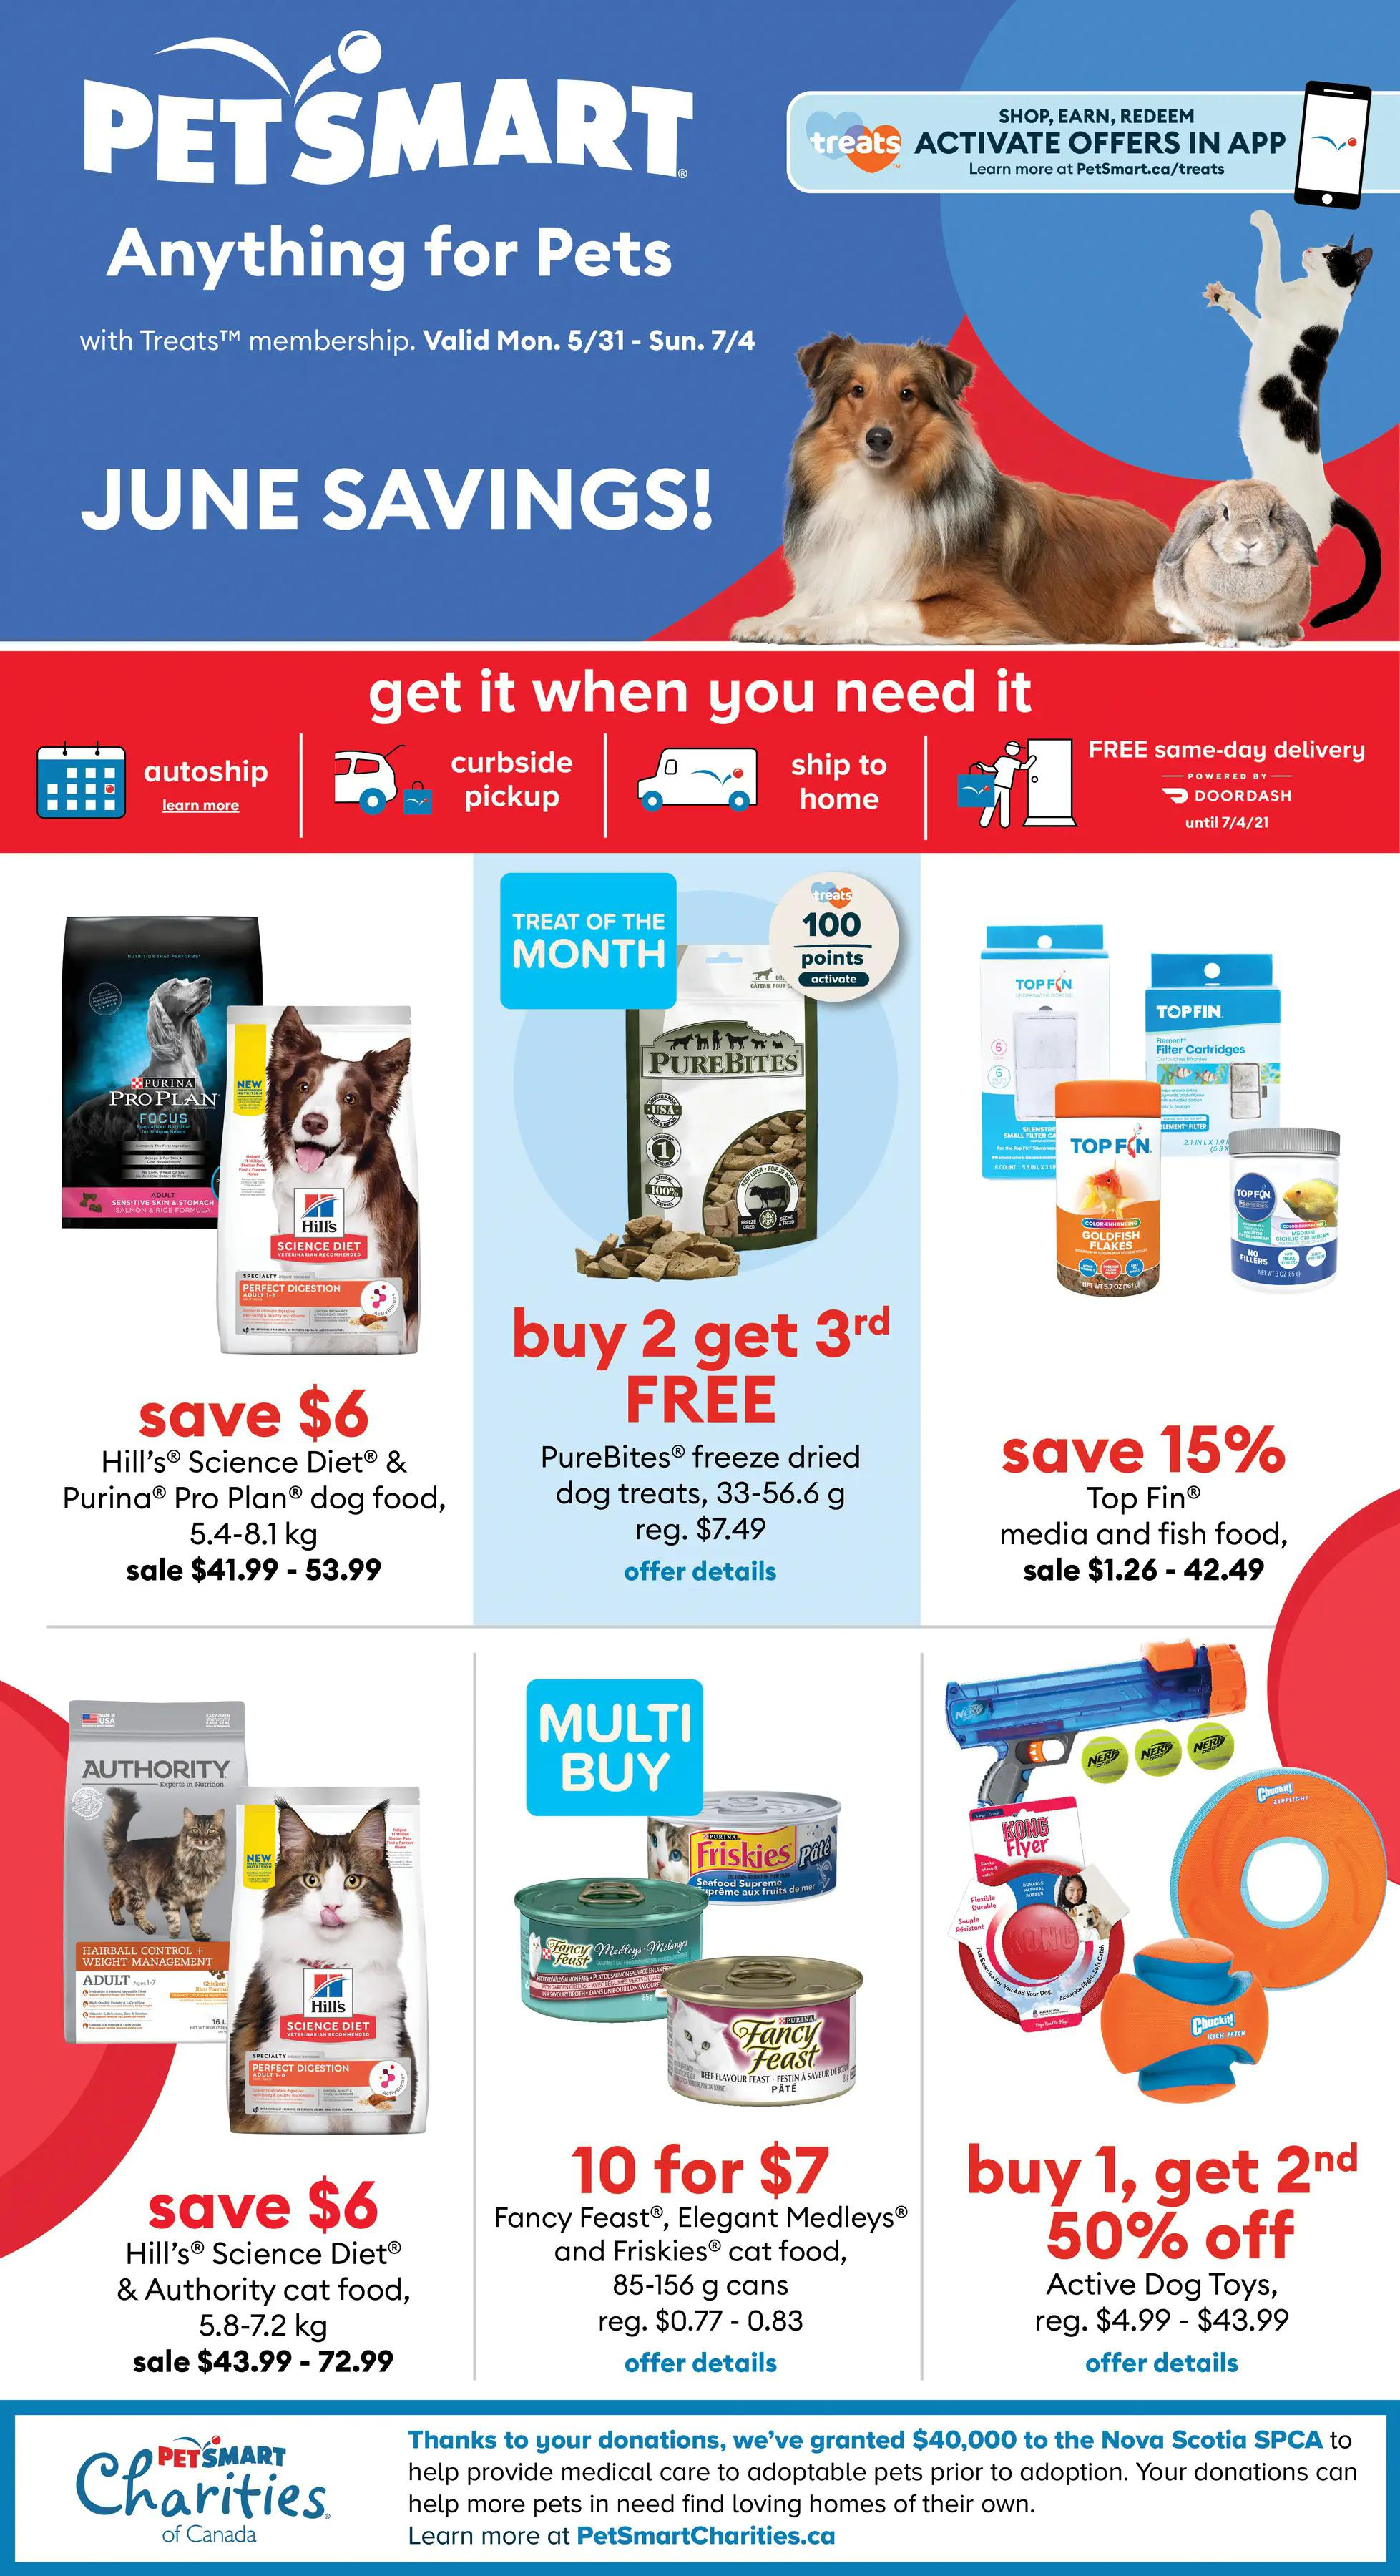 PetSmart - Monthly Savings